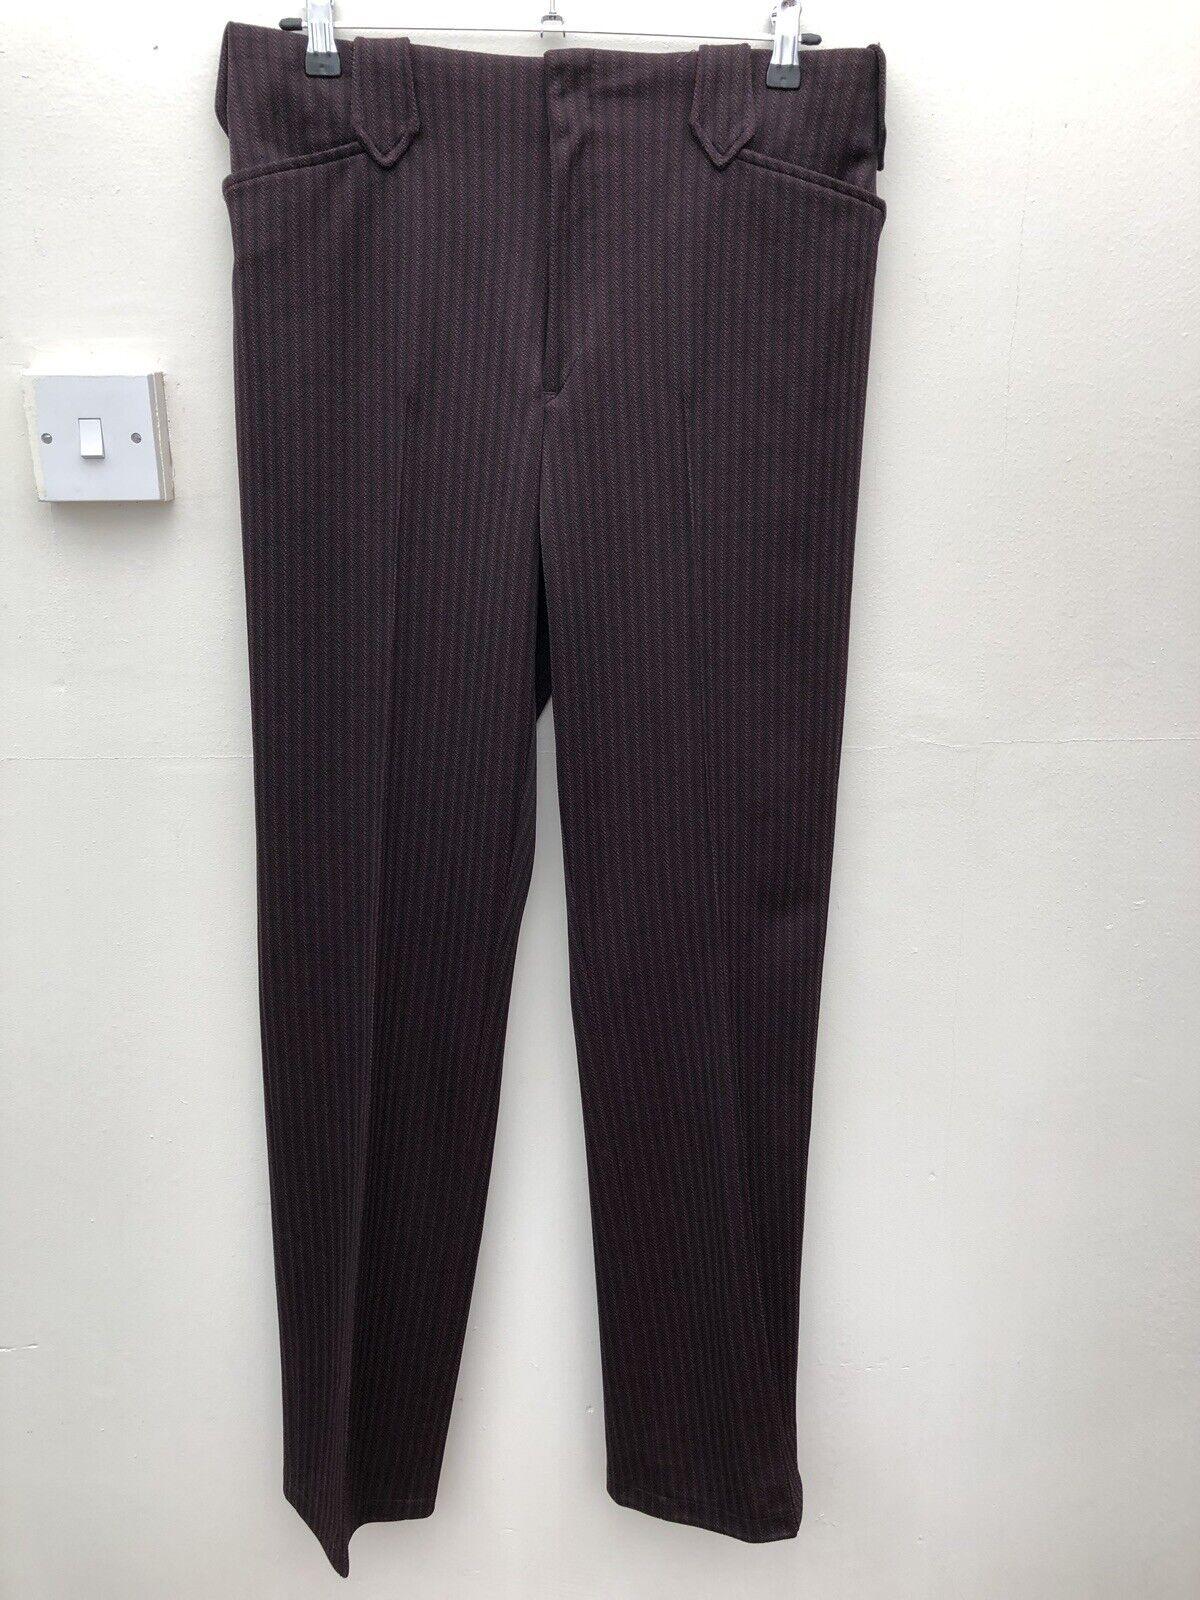 Panhandle Vintage W34 L34 Western High Waist Trousers  Brown Purple Stripe Retro